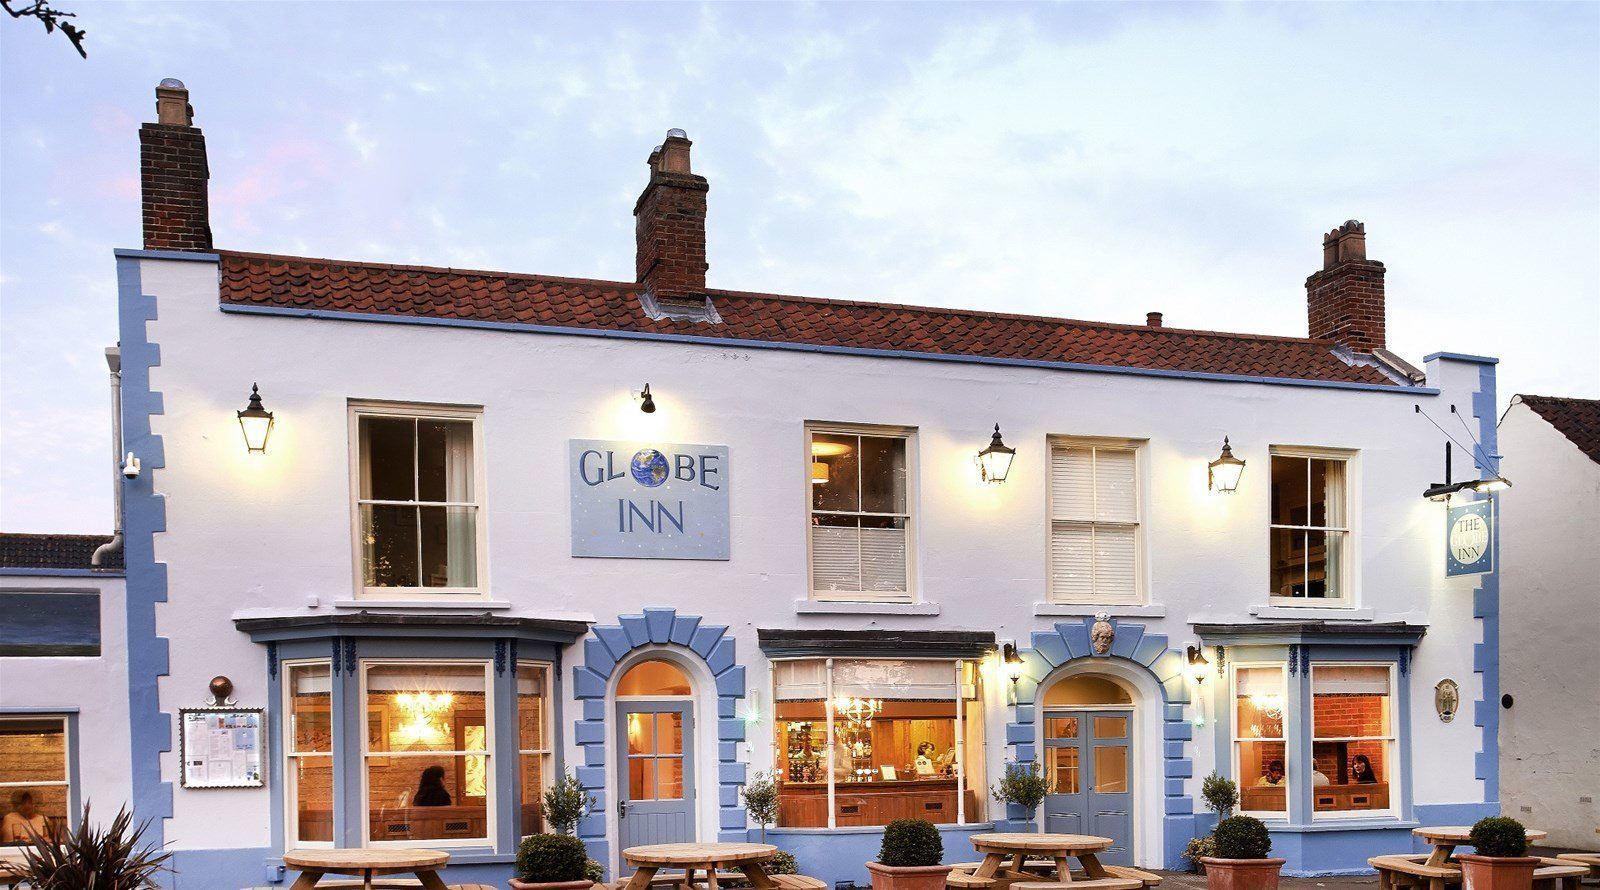 The_Globe_Inn_Wells-next-the-Sea_North_Norfolk12may16115119